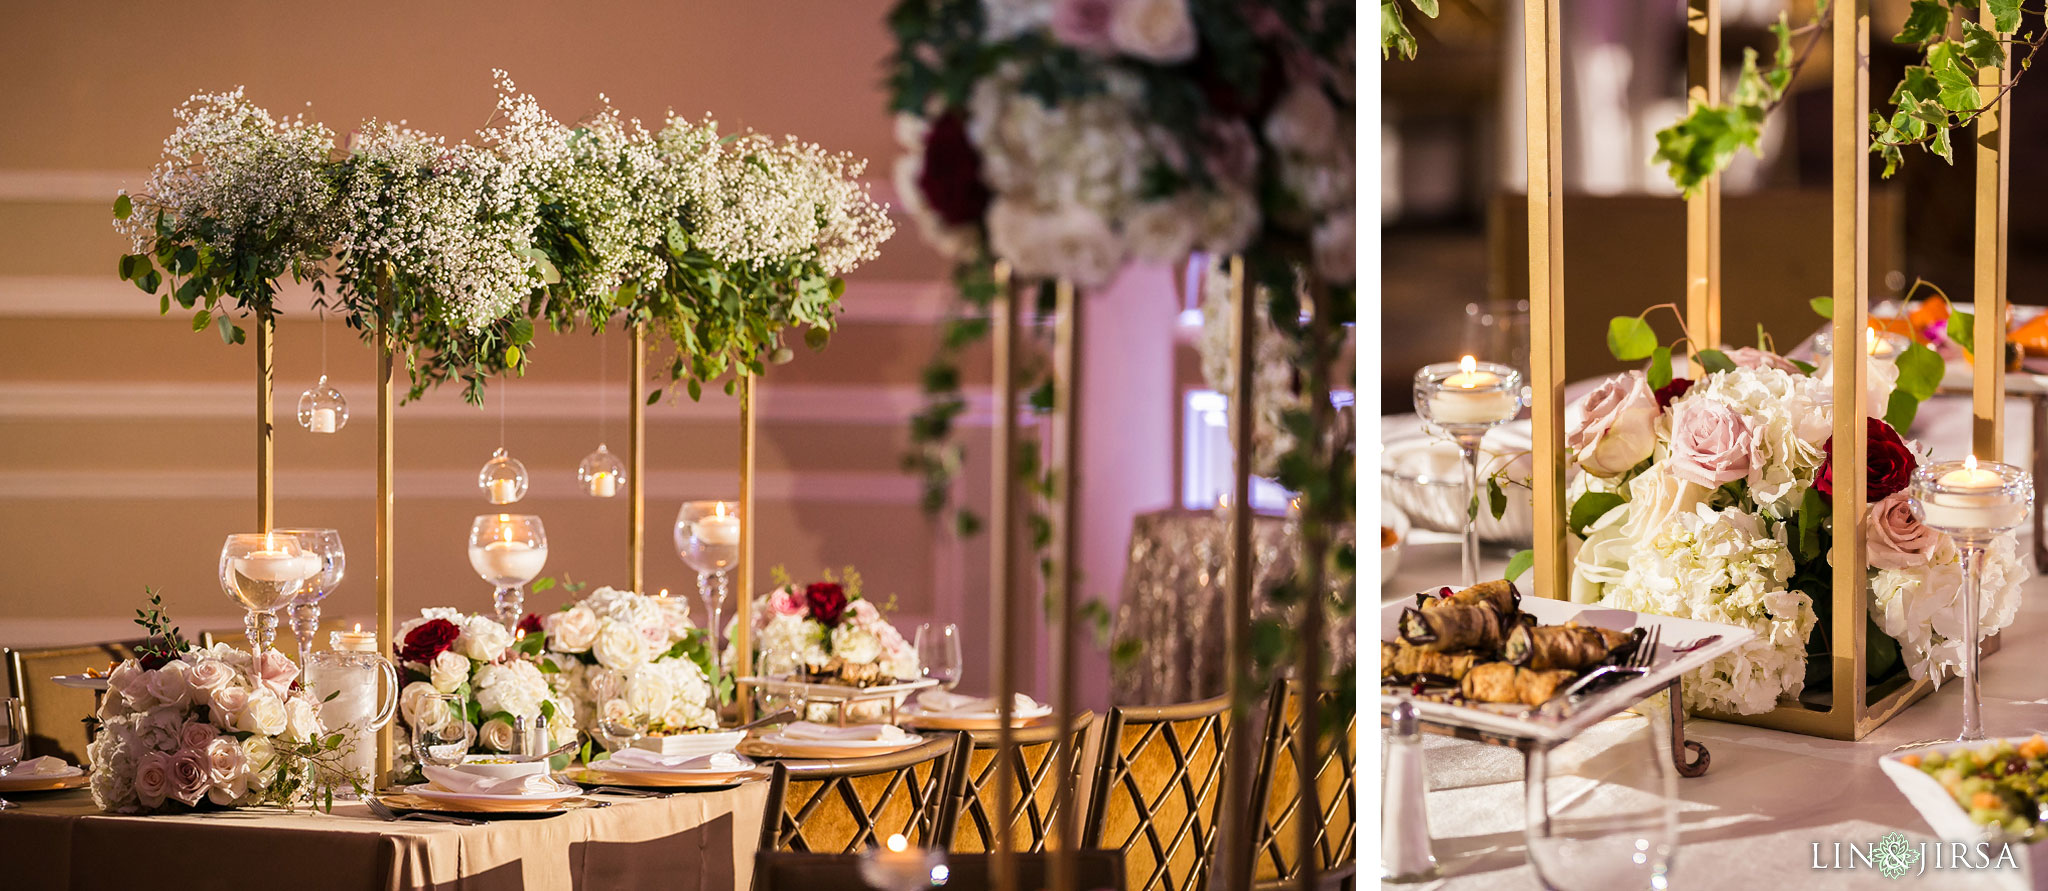 022 taglyan complex los angeles persian wedding photography